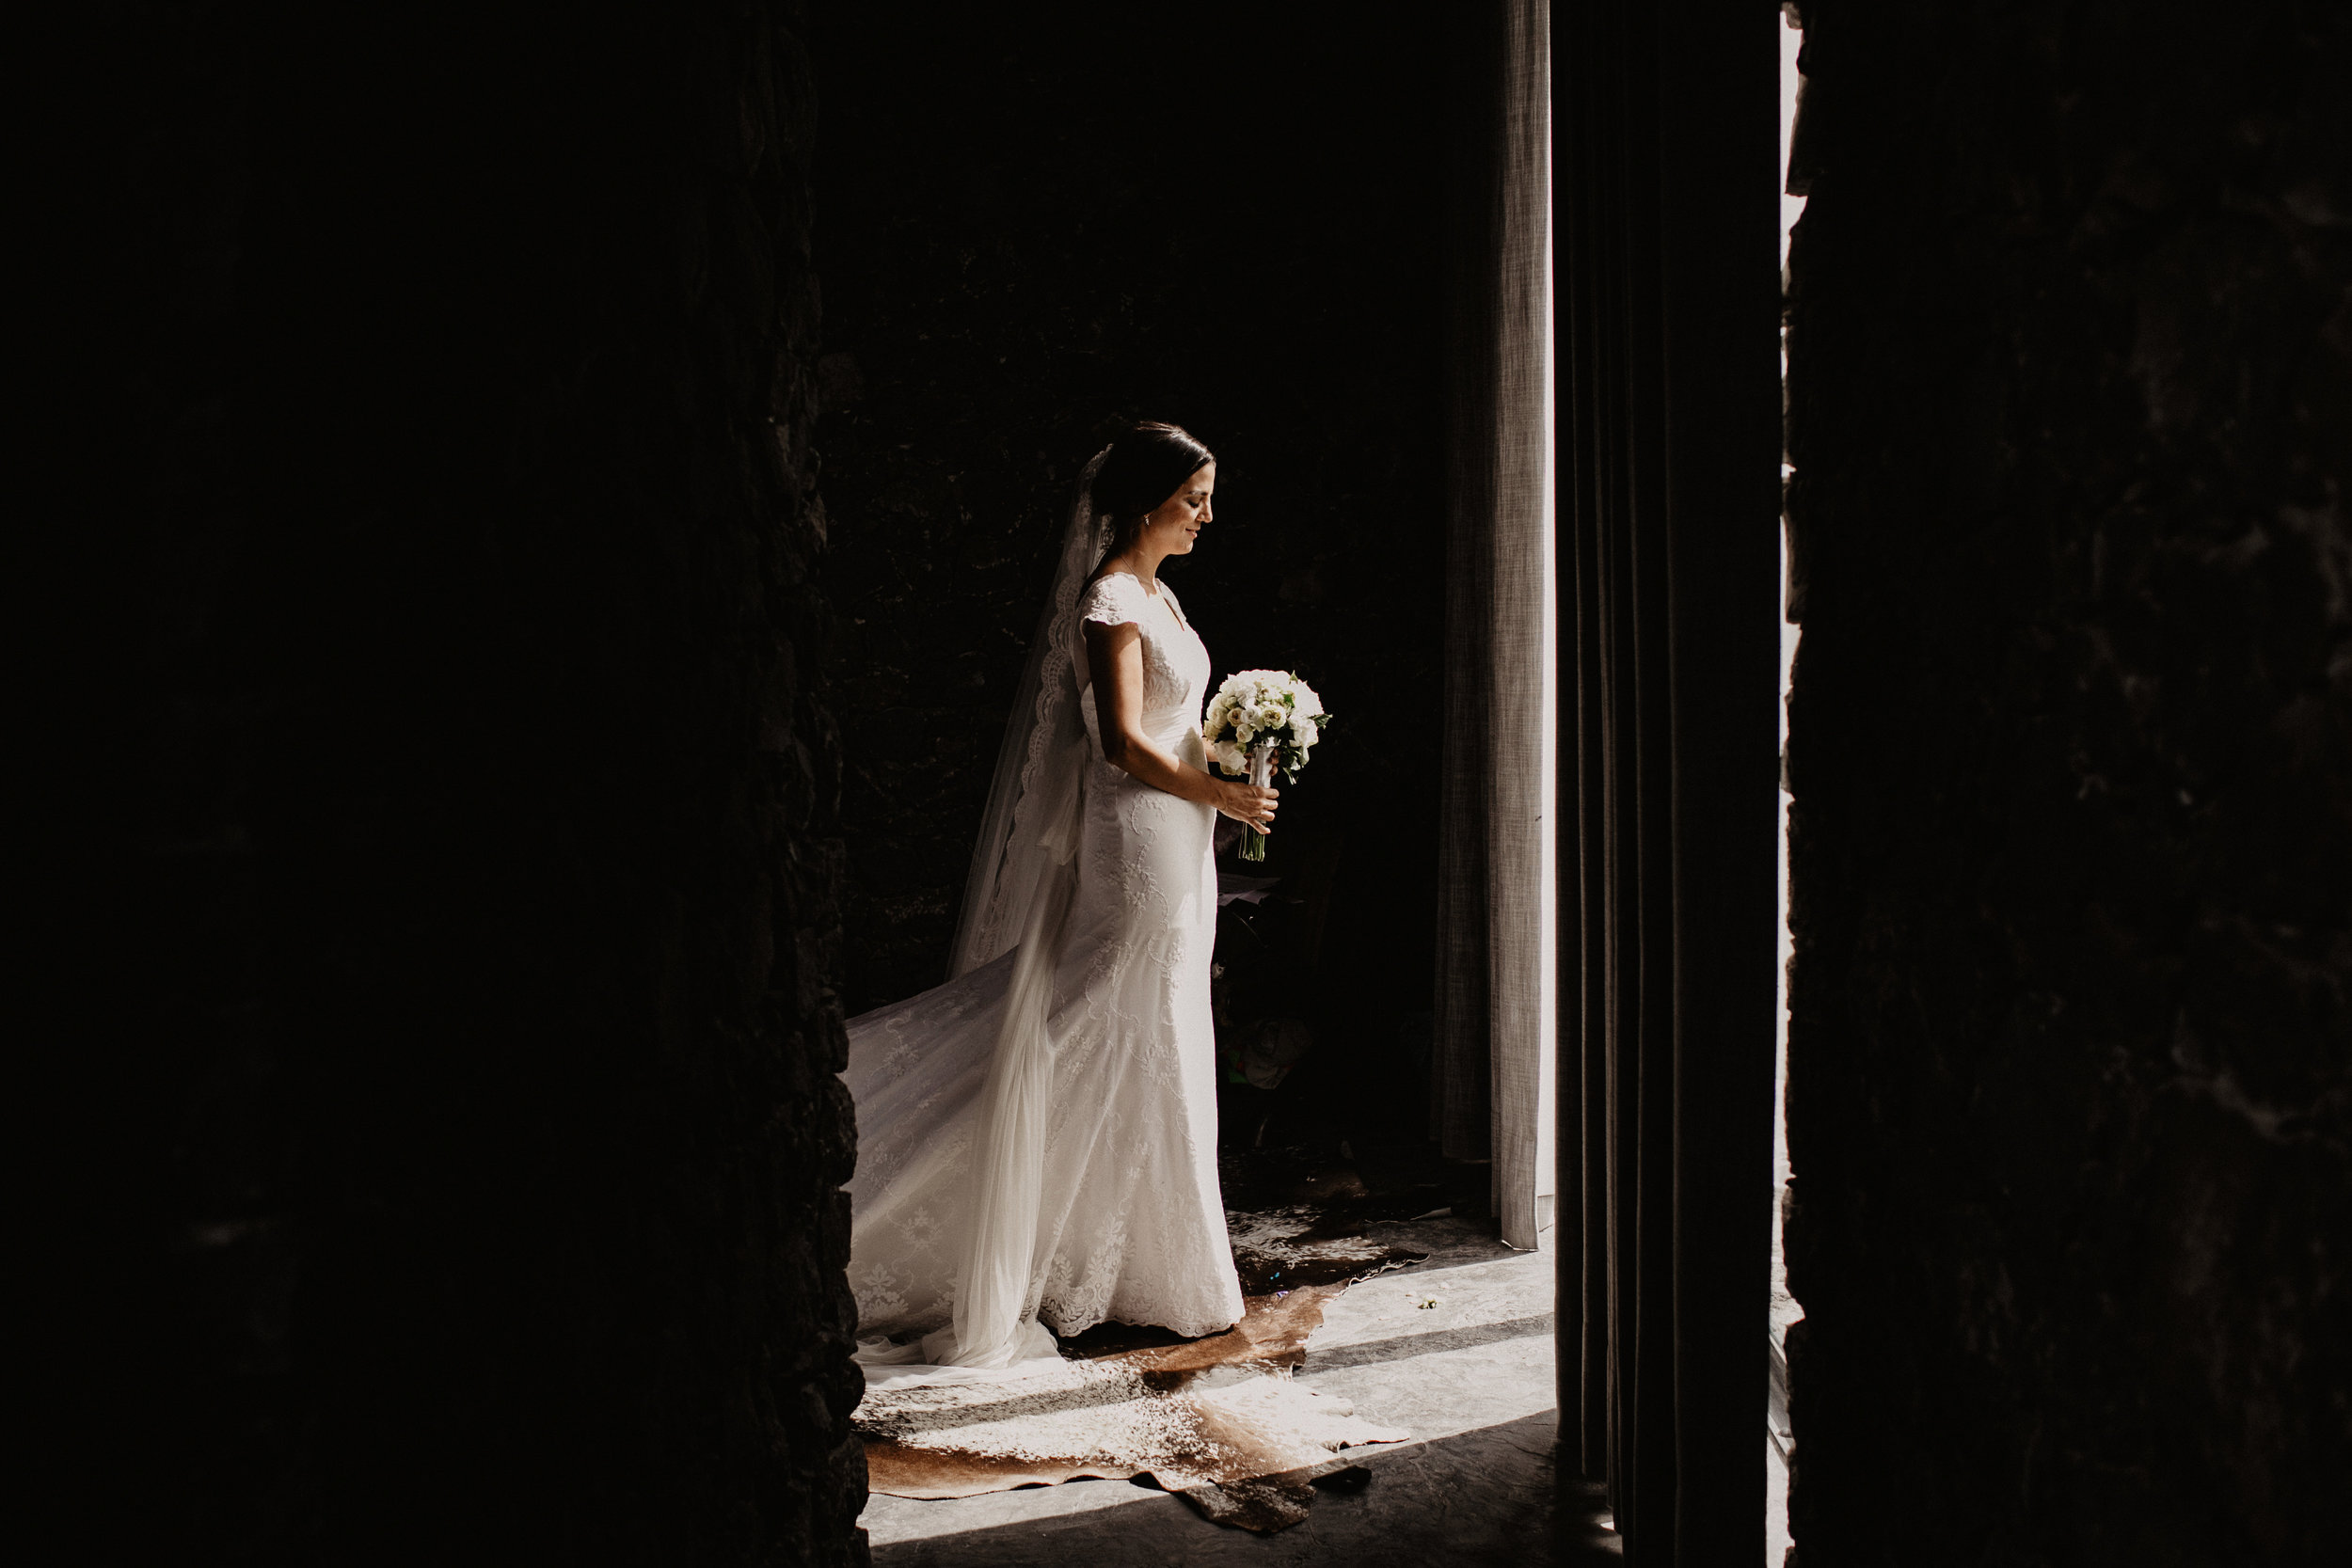 alfonso_flores_destination_wedding_photographer_pau_alonso_740.JPG